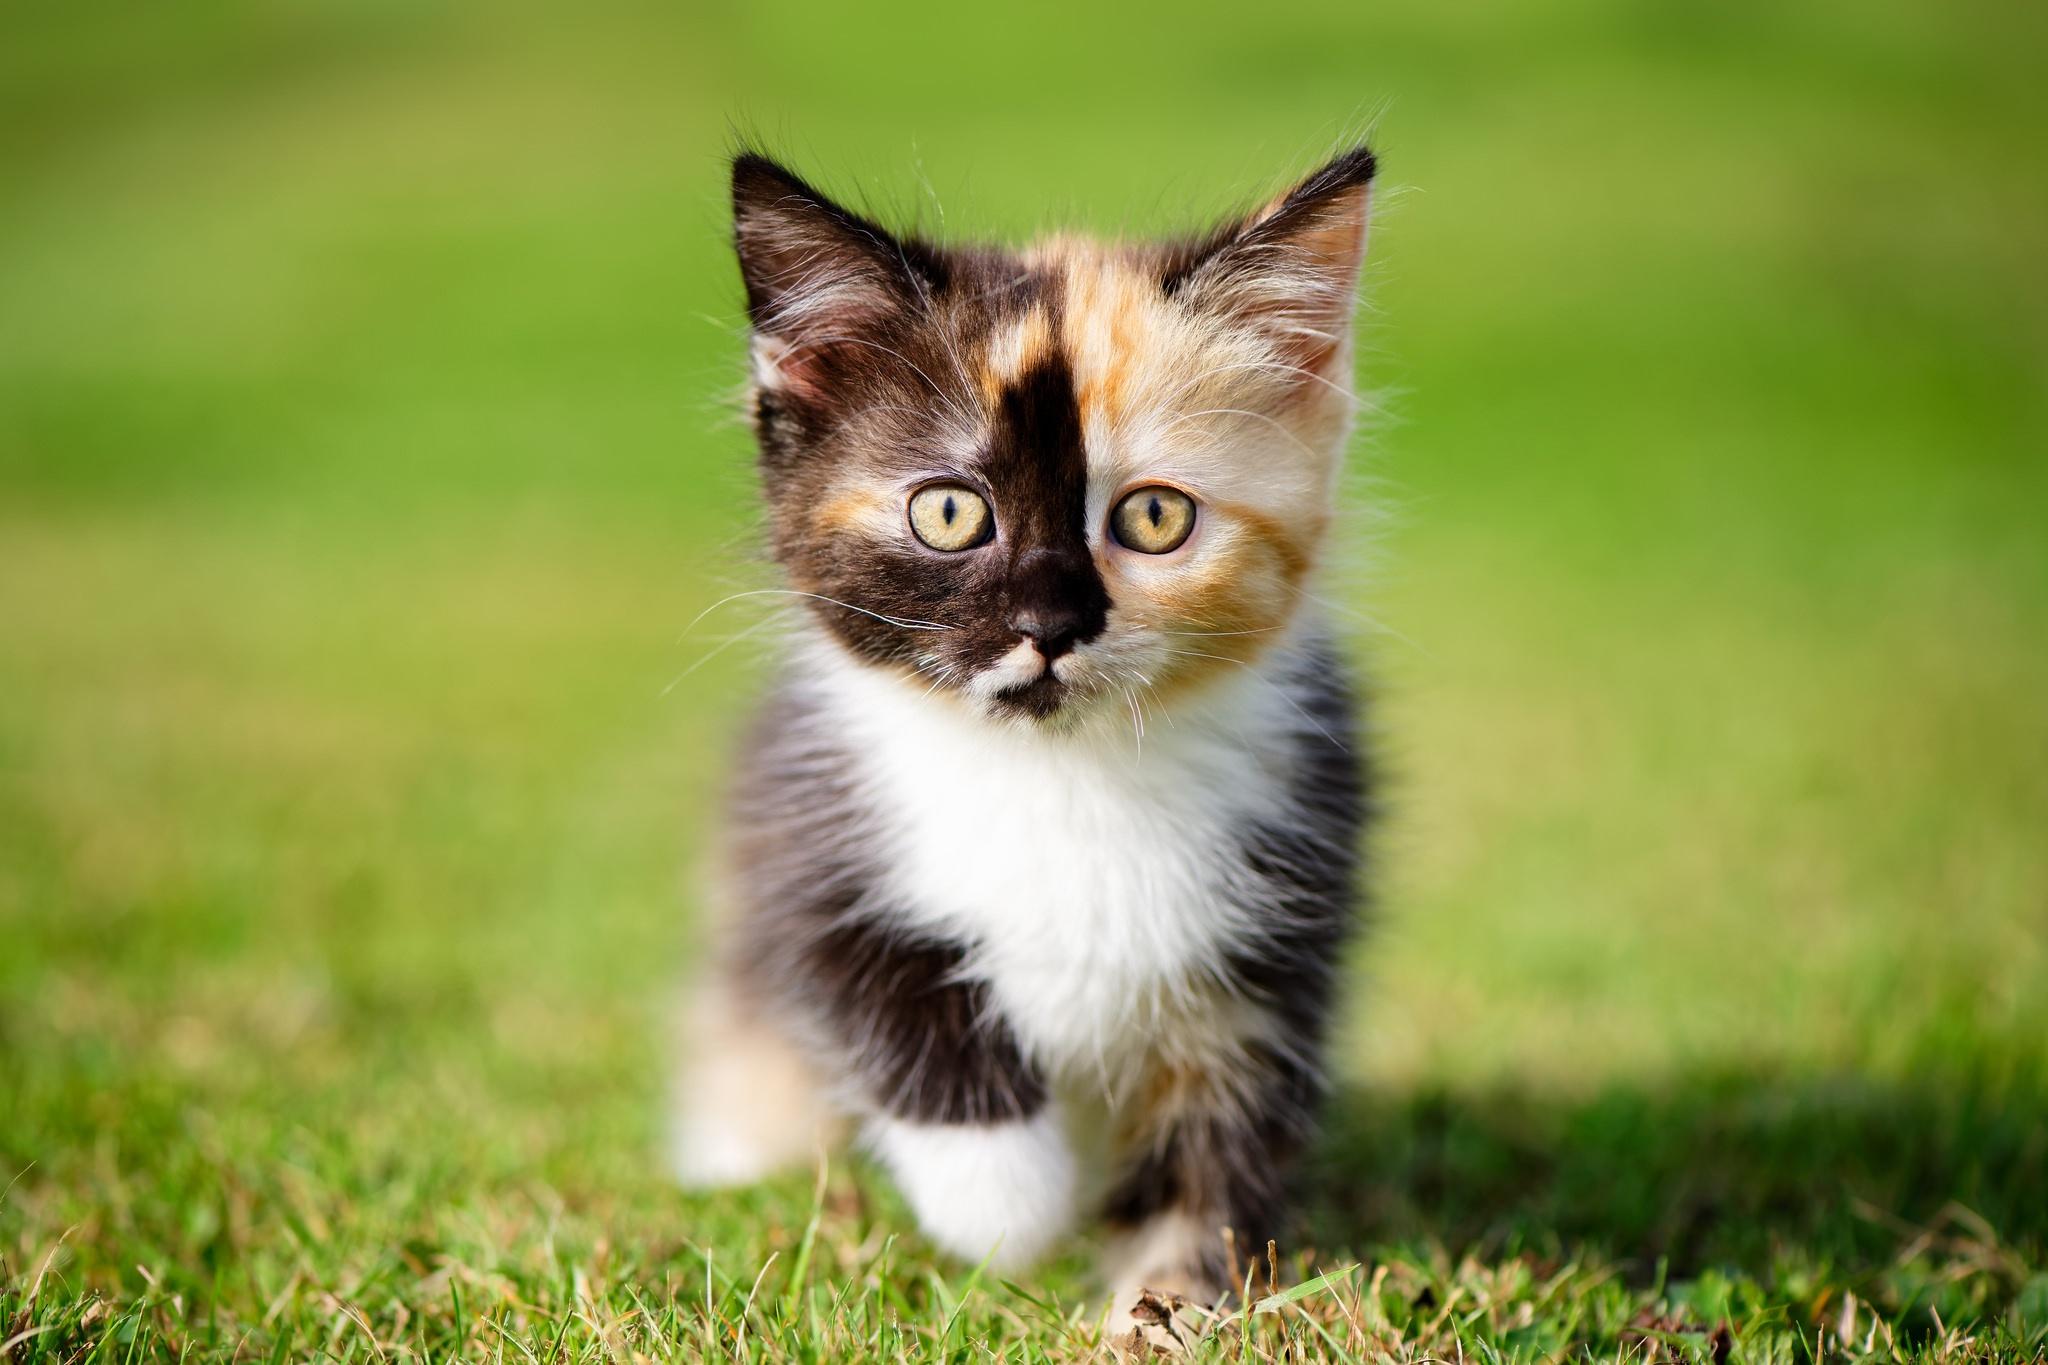 Котенок на травке  № 2954254 бесплатно